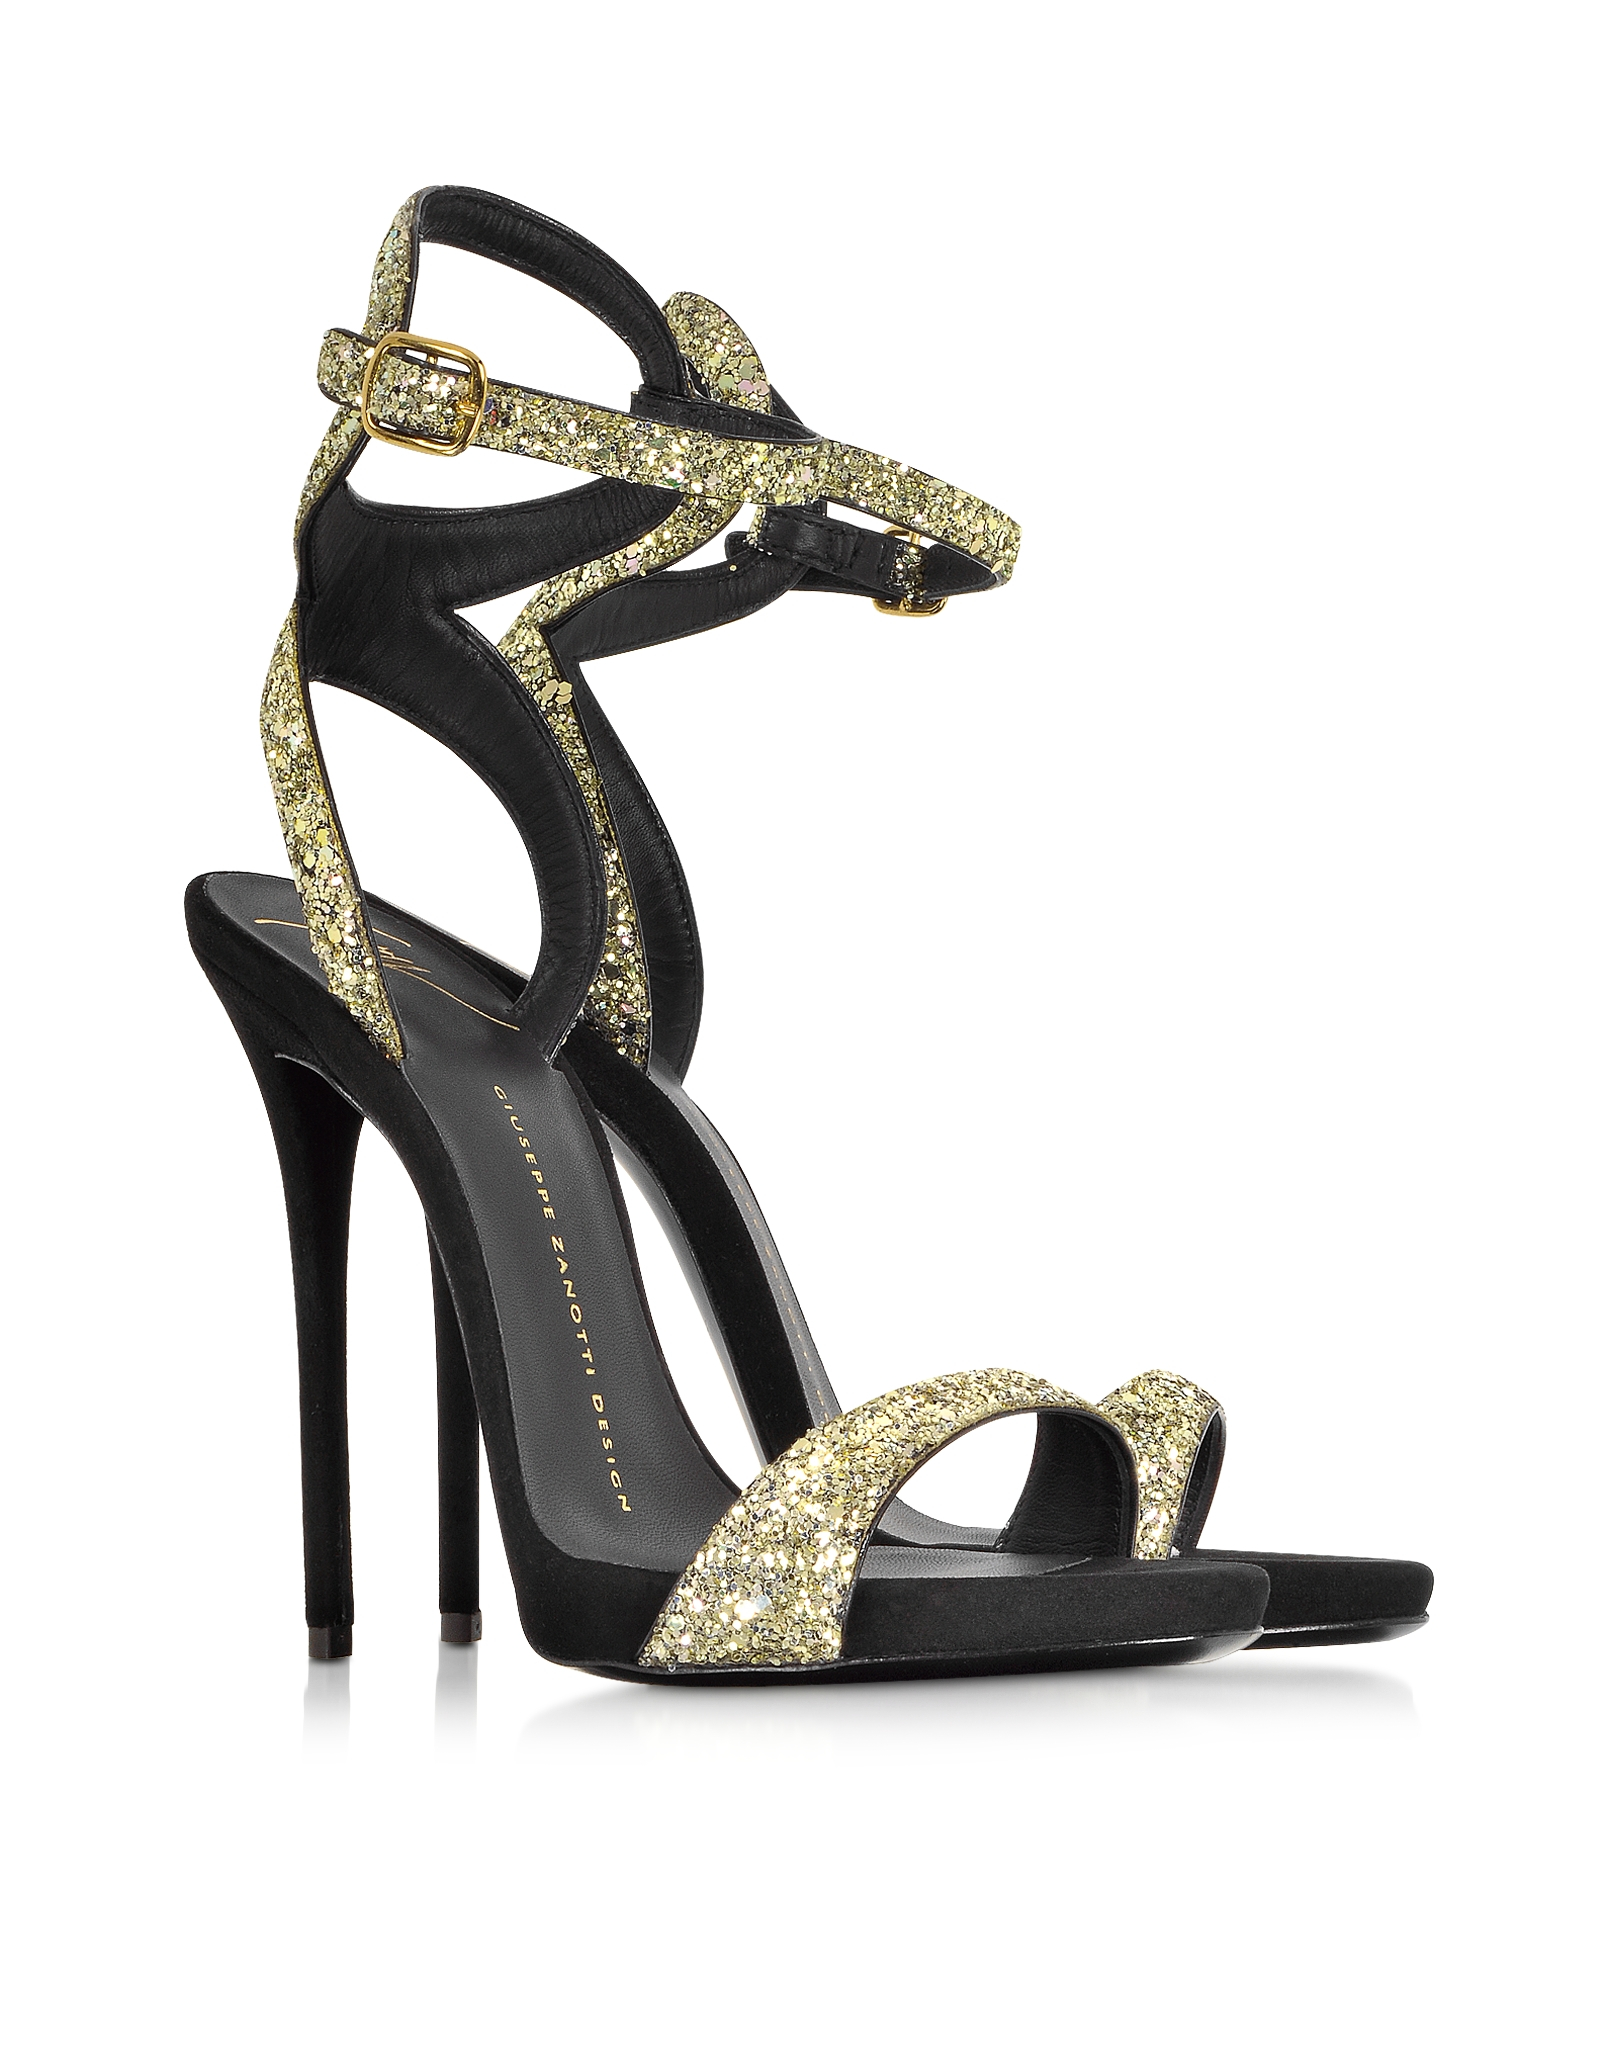 Giuseppe Zanotti Gold Glitter Ankle Strap Sandal In